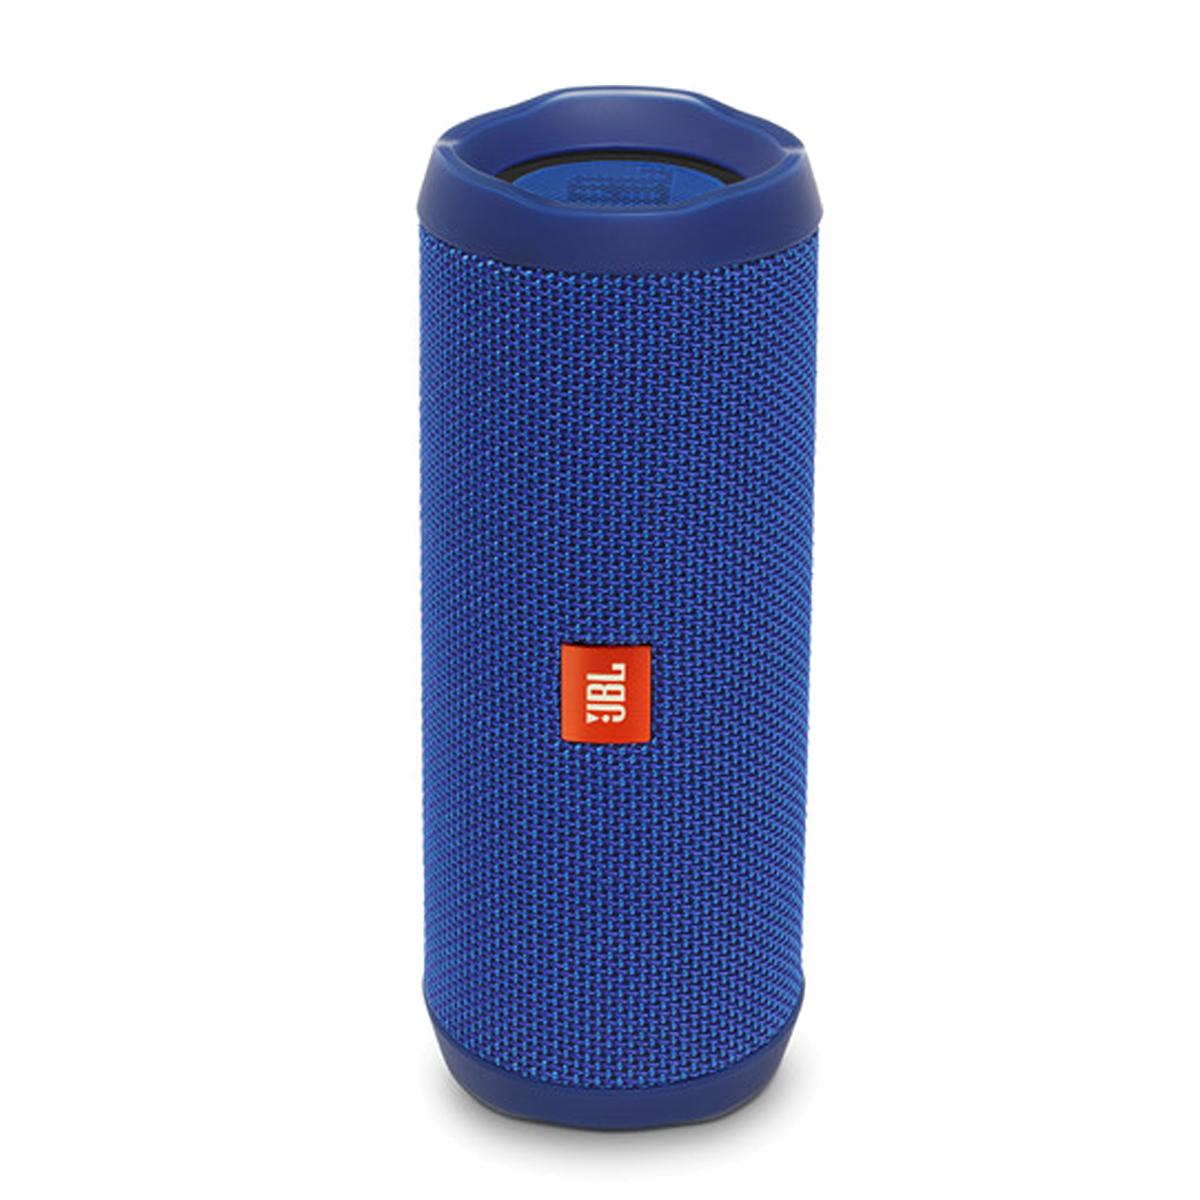 Flip 4 無線防水藍牙喇叭 藍色 -平衡進口貨